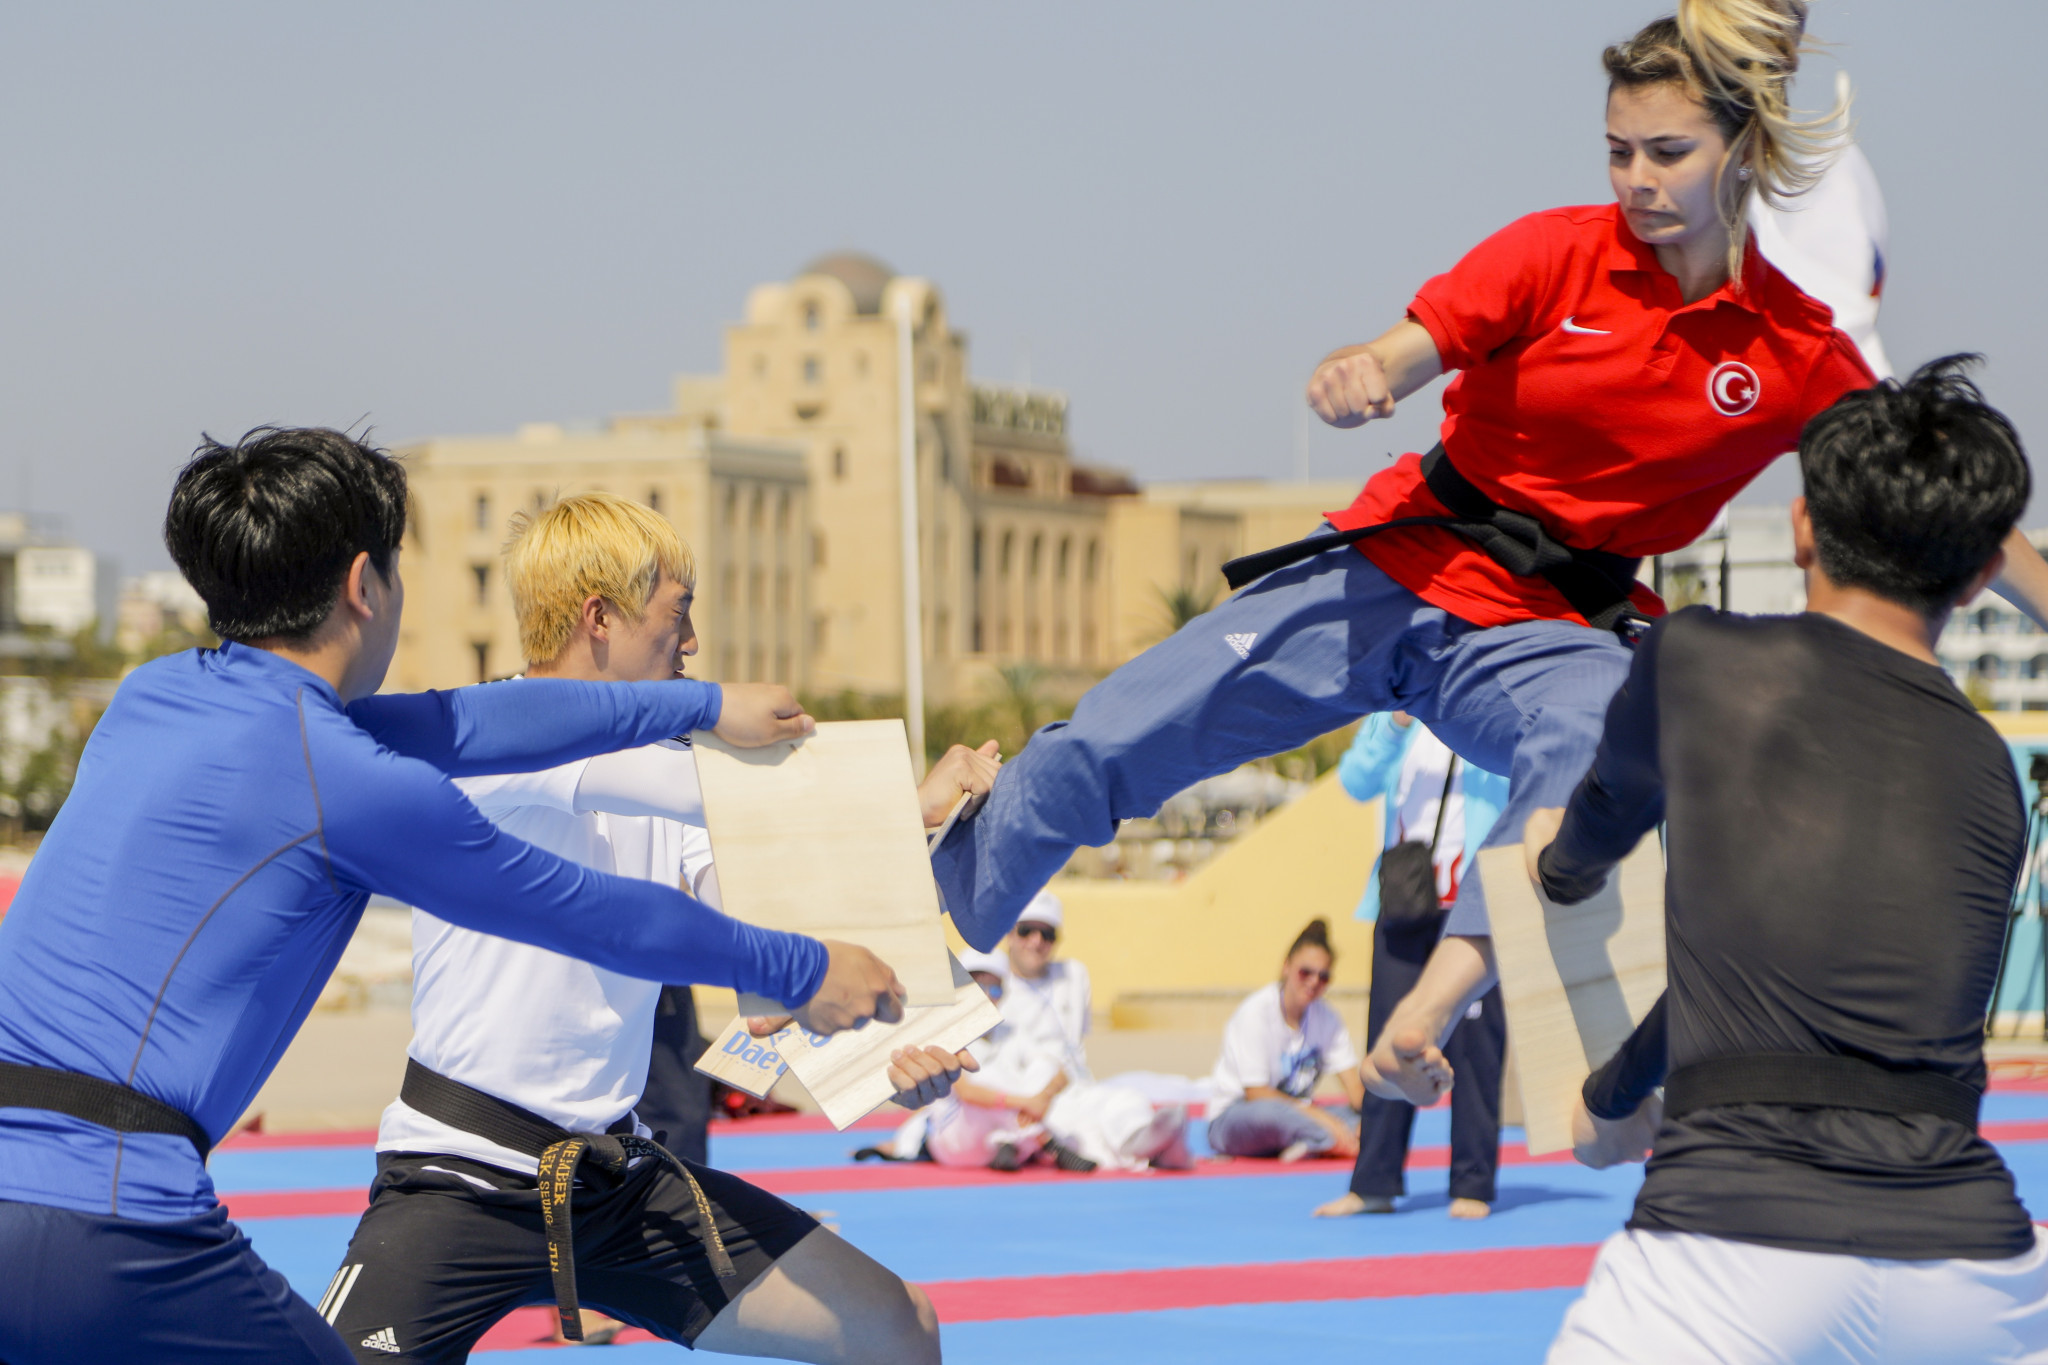 The World Taekwondo Beach Championships is being broadcast live on the Olympic Channel ©World Taekwondo